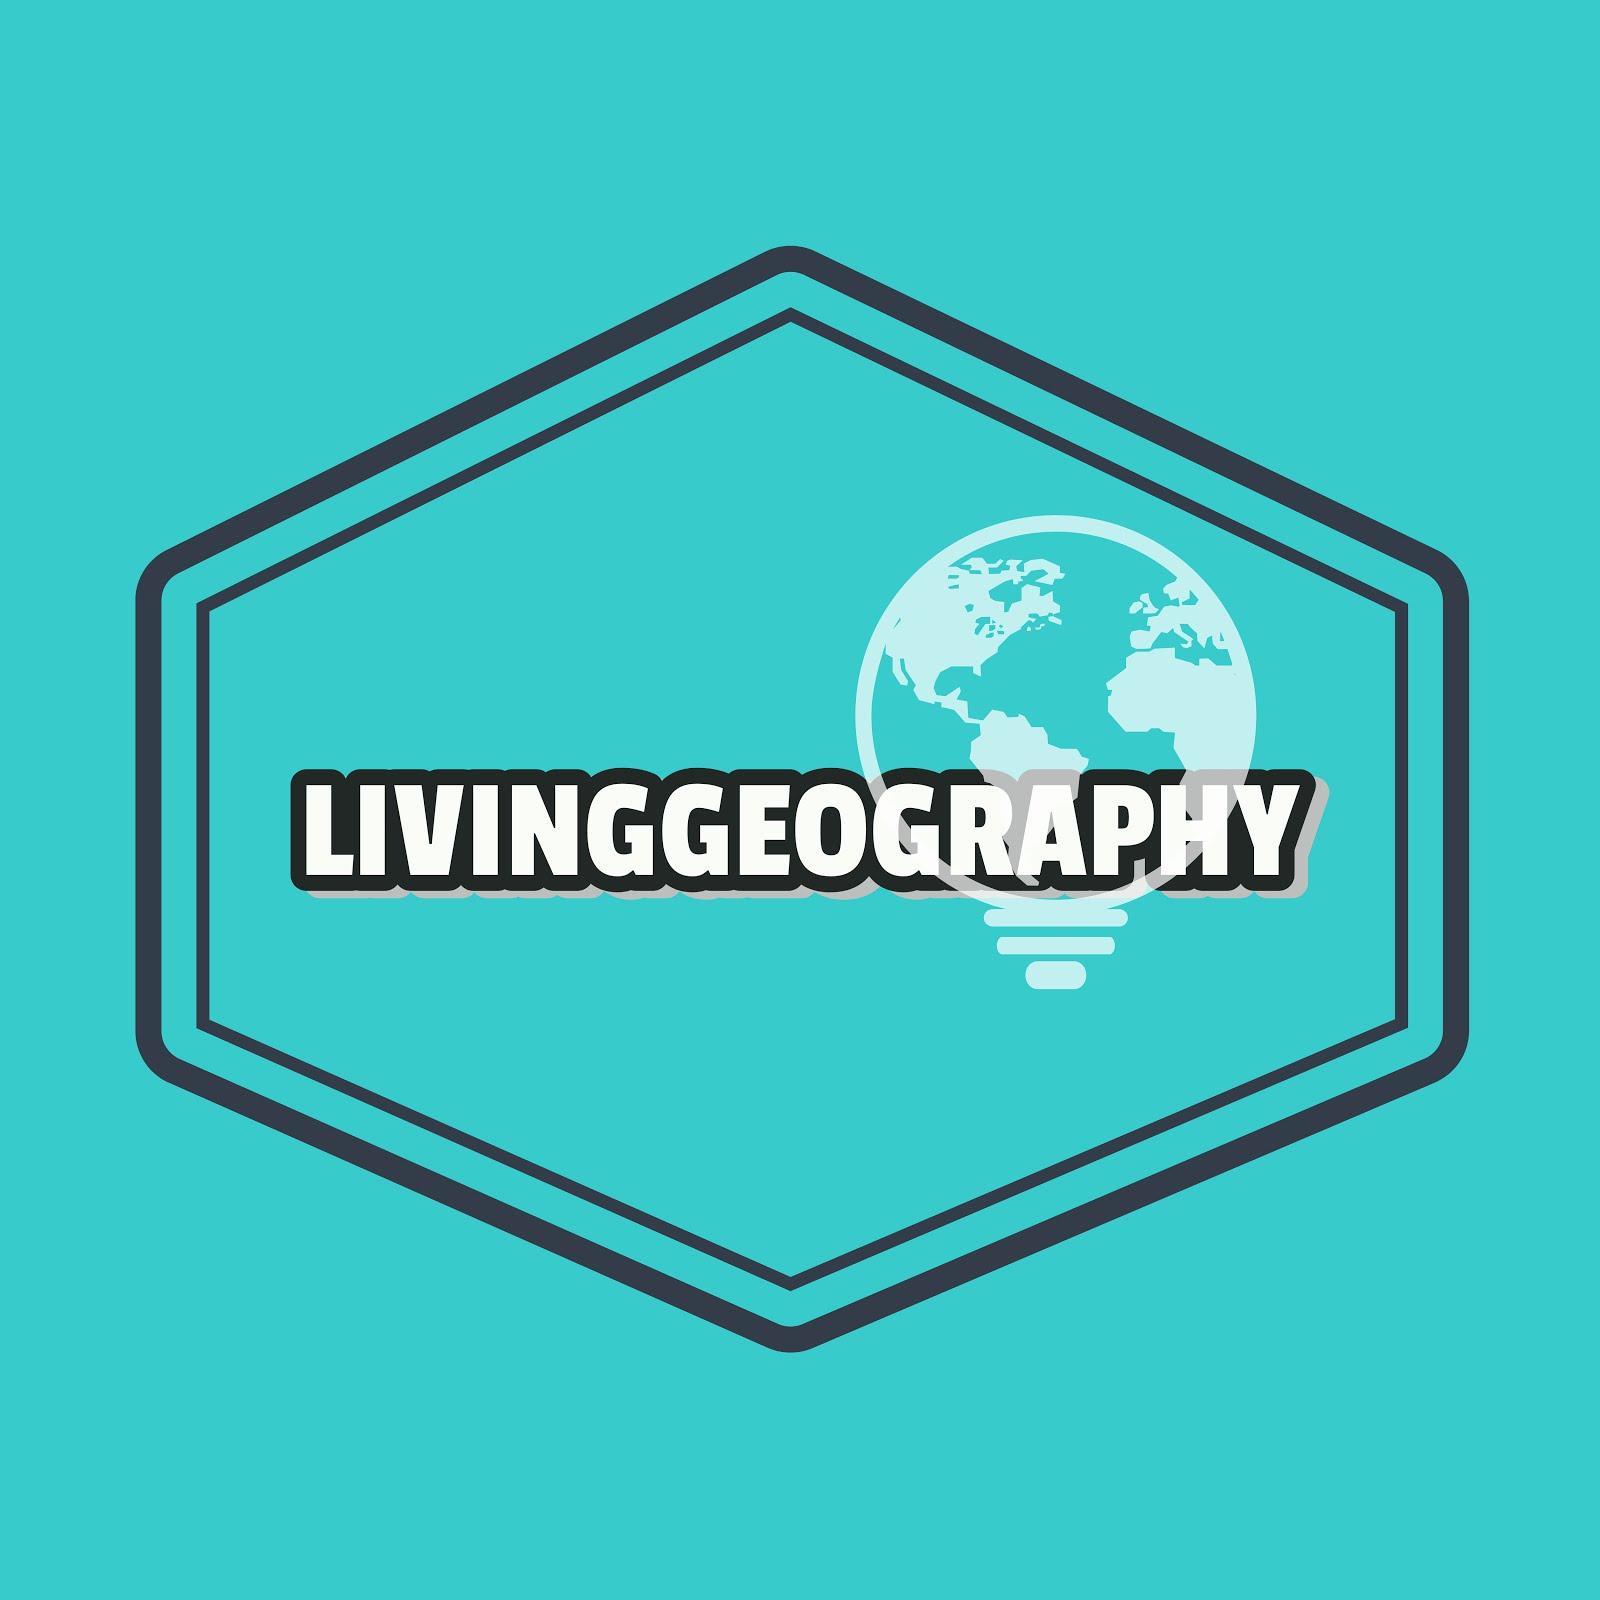 LivingGeog